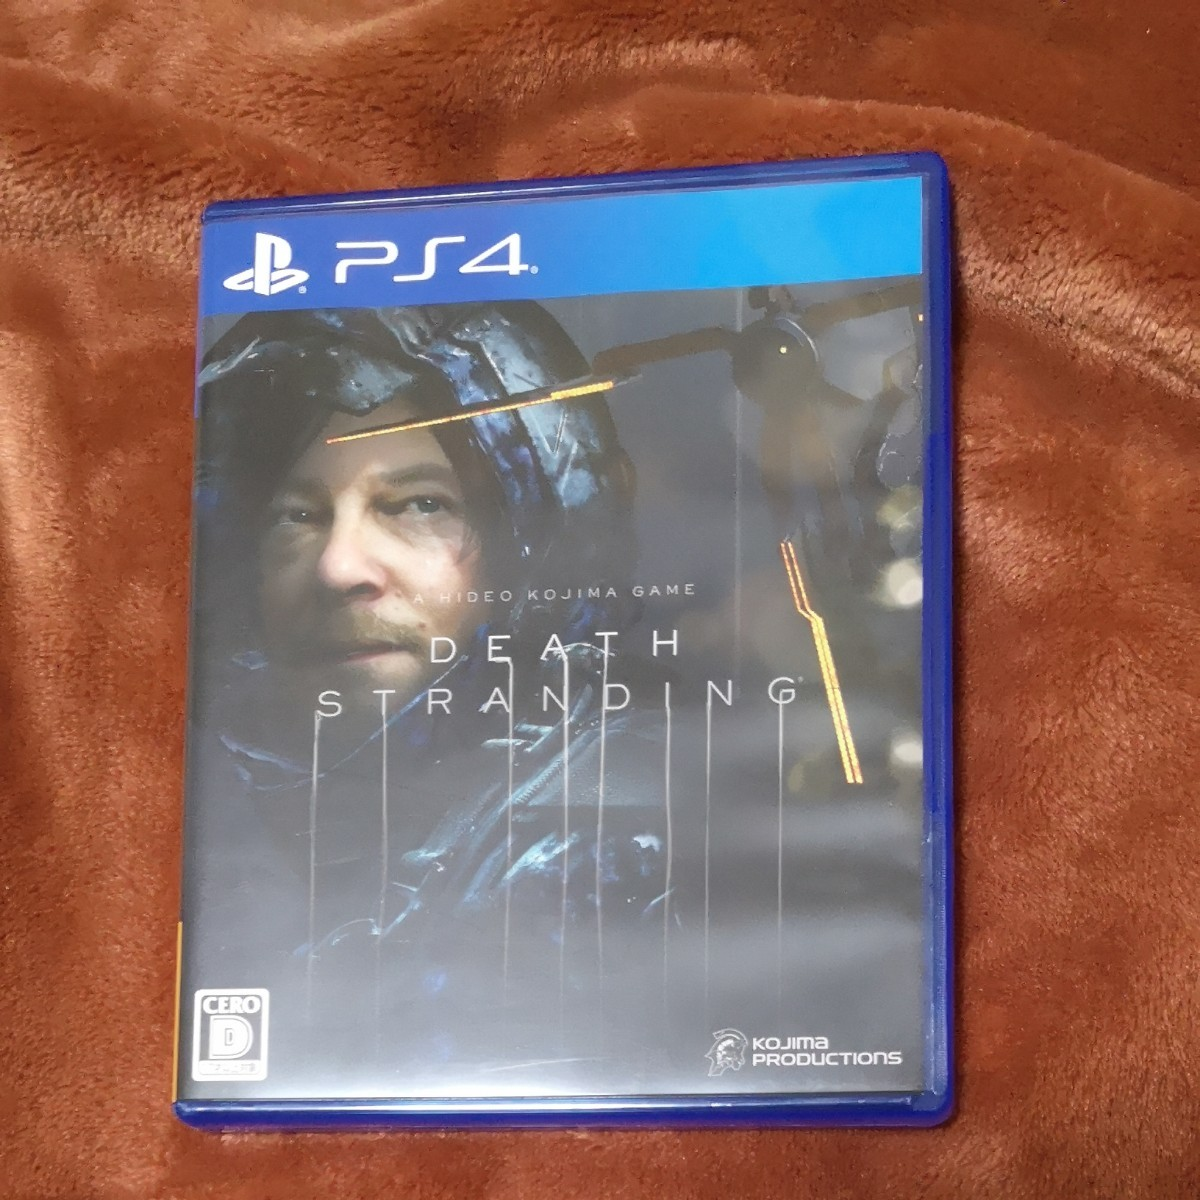 PS4 death stranding デス ストランディング